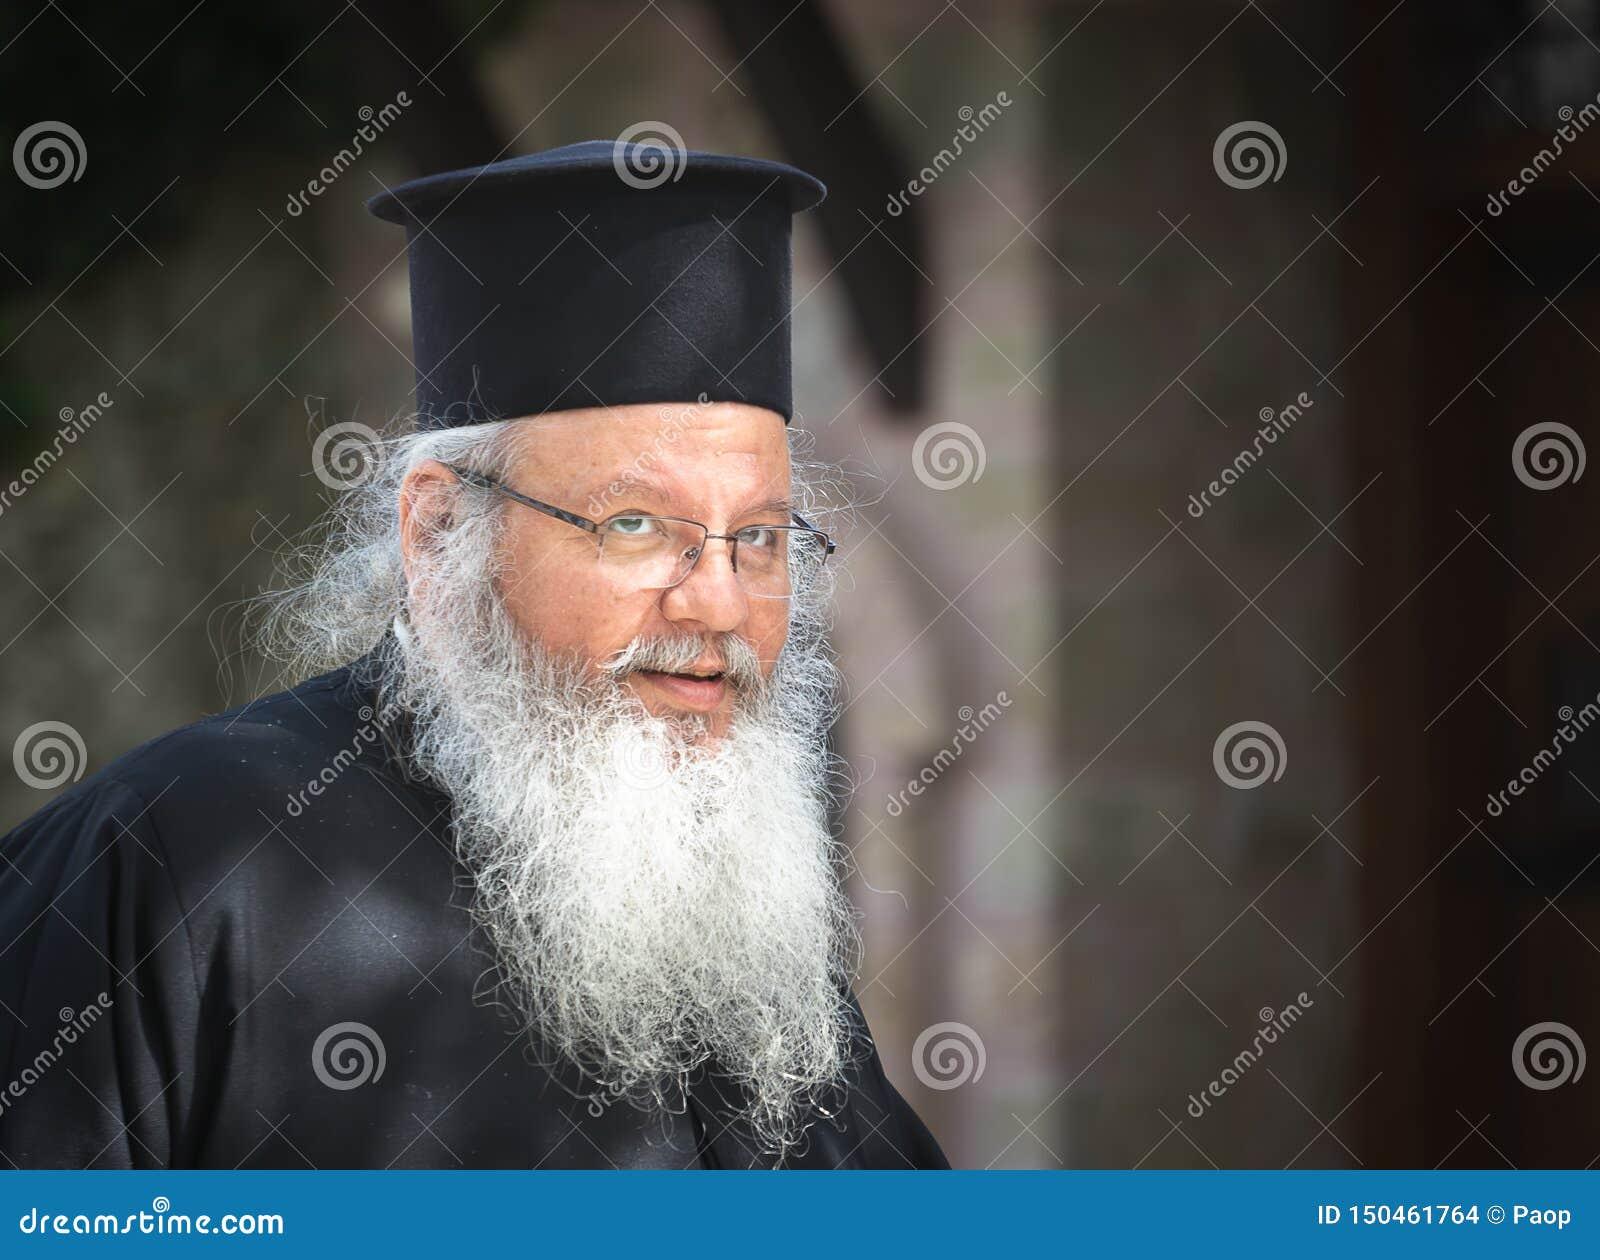 The portrait of orthodox priest